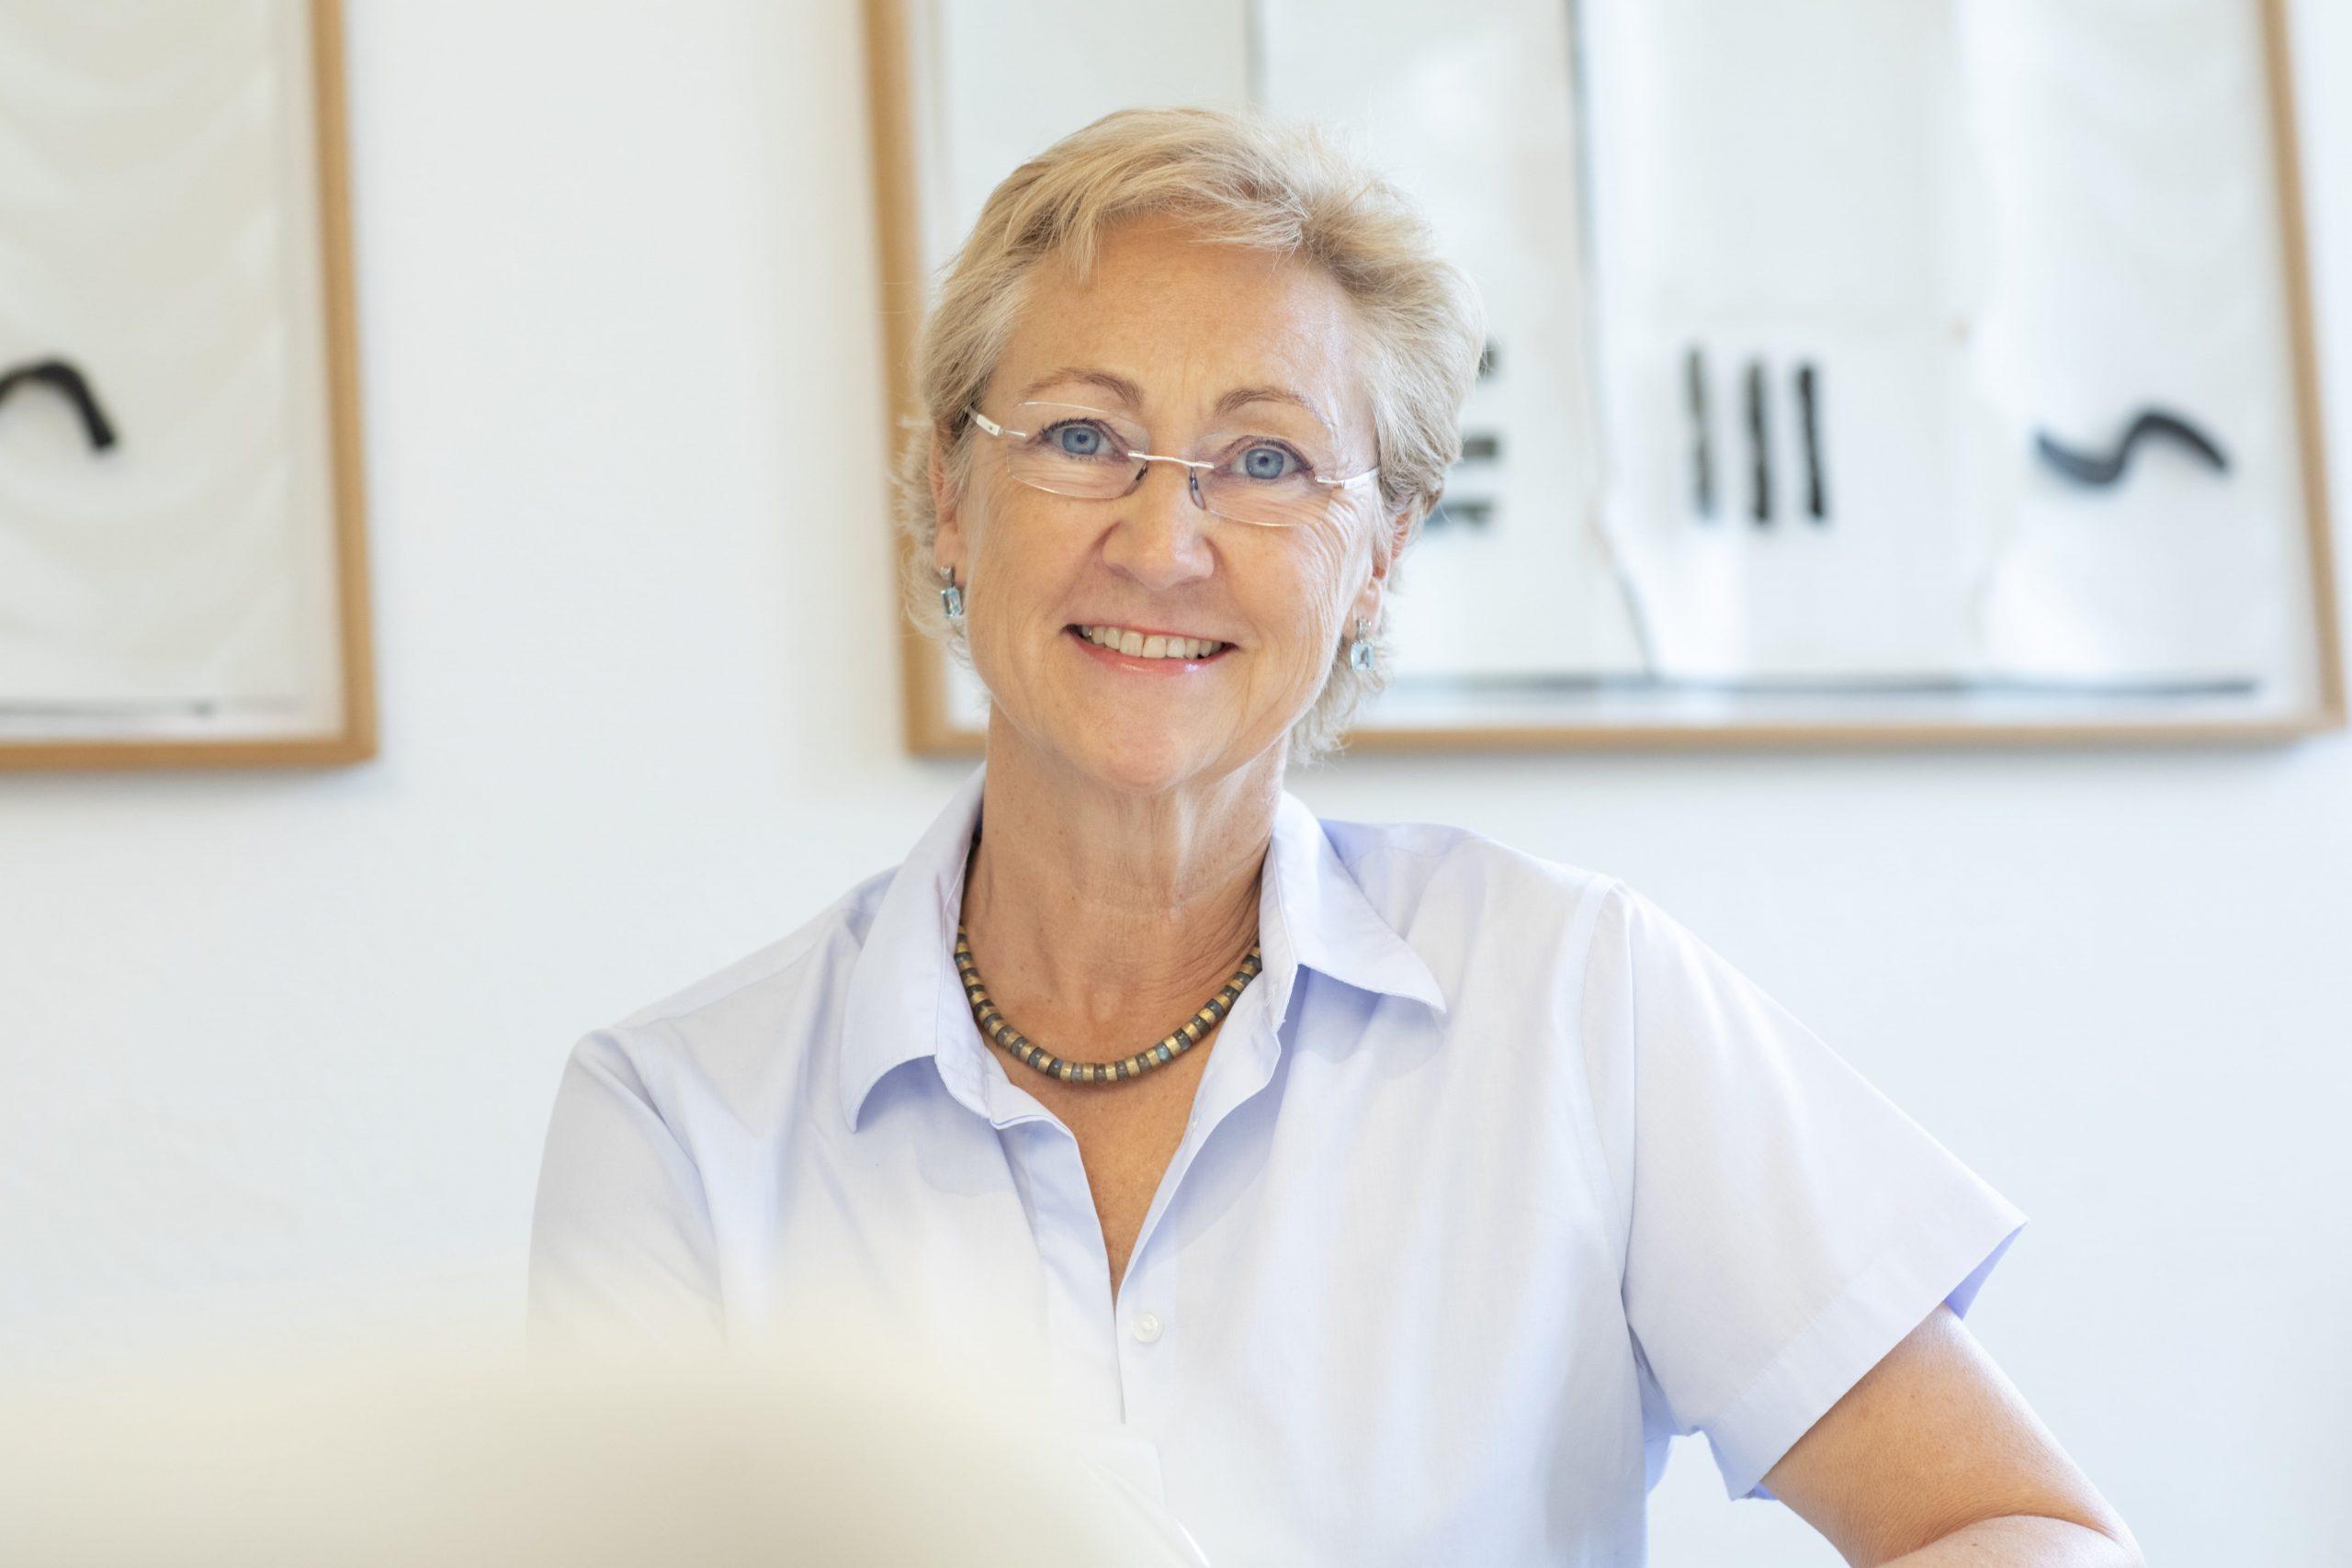 Andrea Steffen - Steuerberater Eggeling und Partner in Düsseldorf